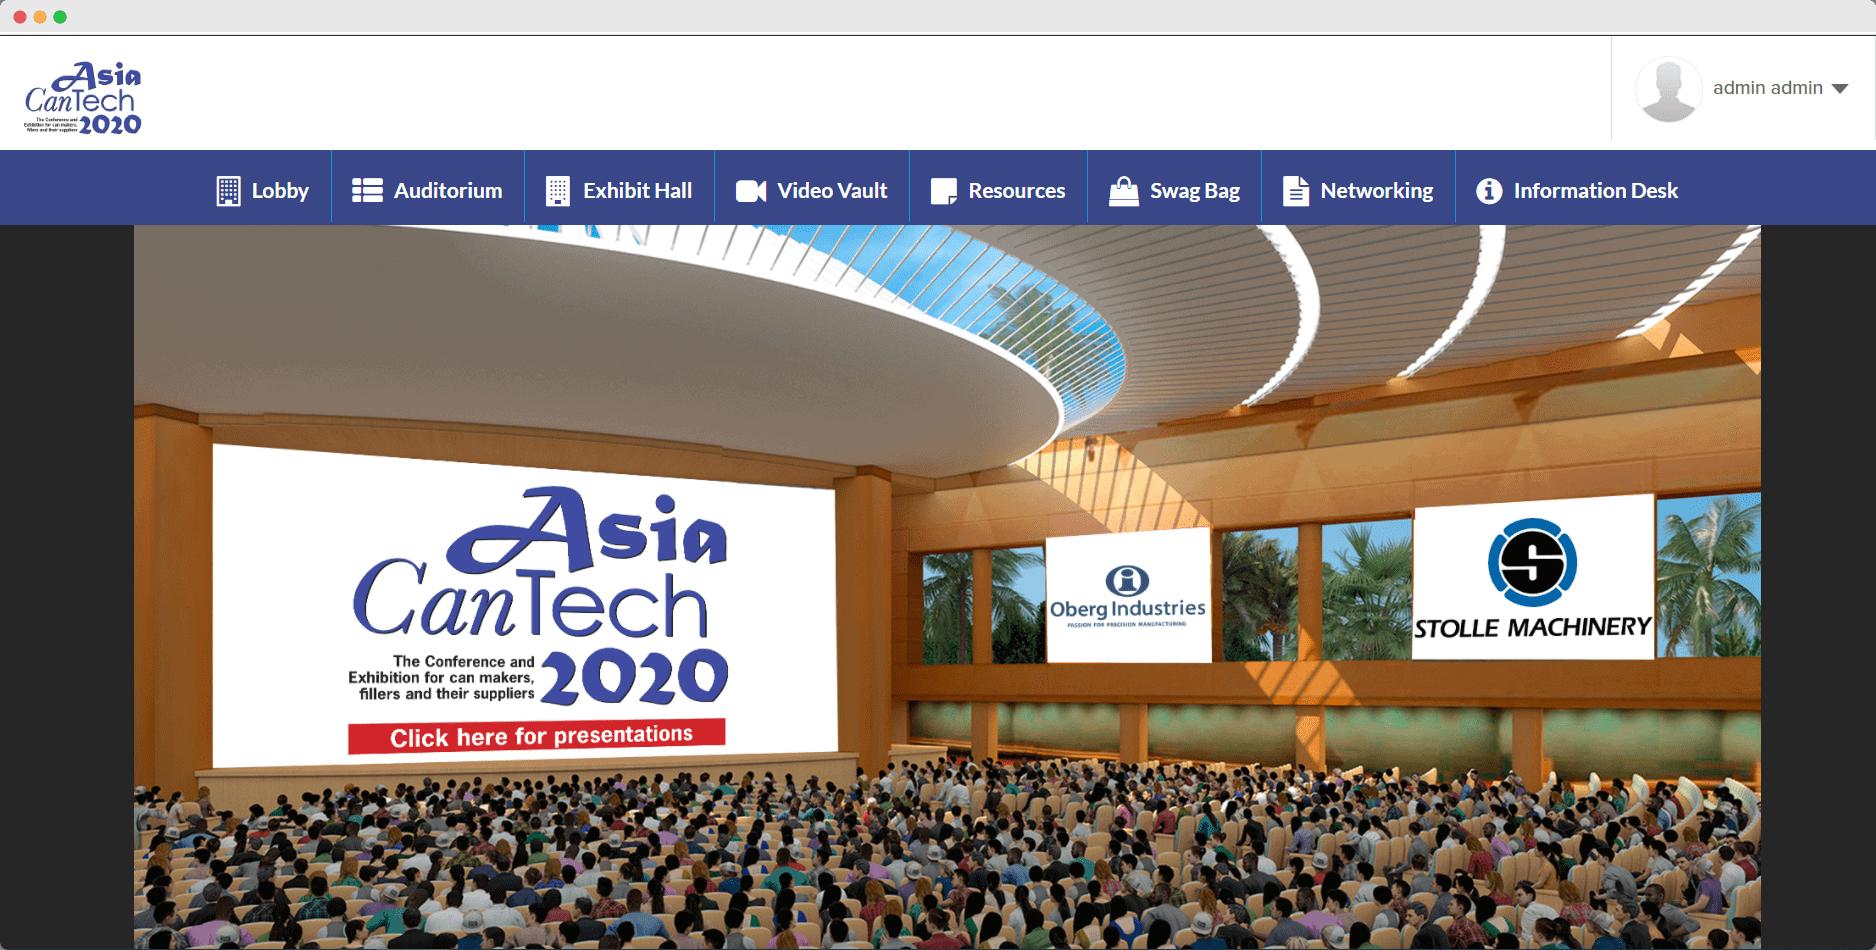 Asia CanTech virtual conference auditorium